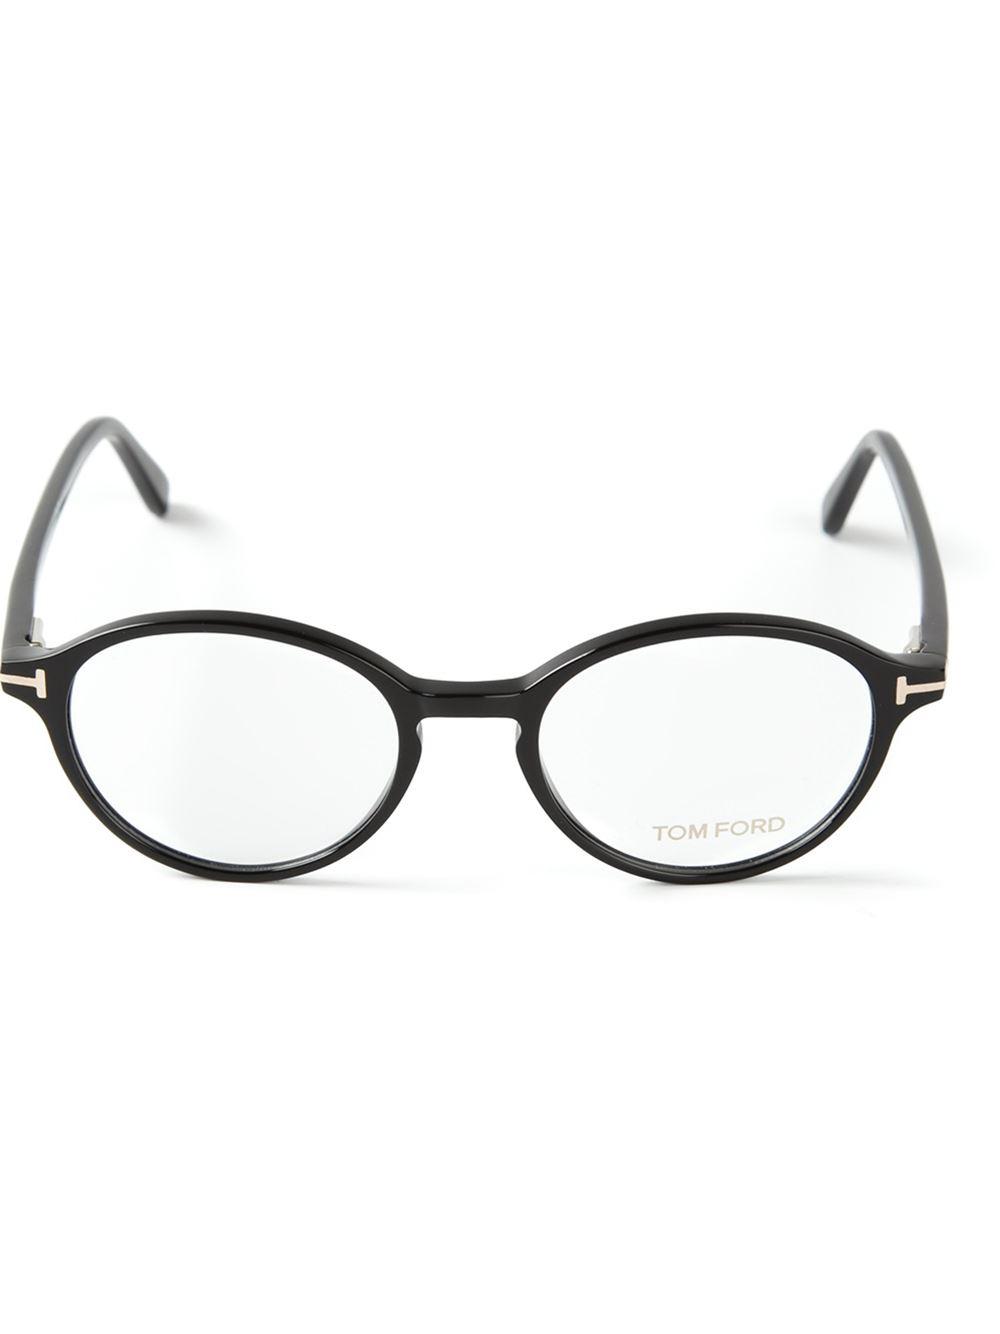 ae7961972031d Tom Ford Round Frame Glasses in Black - Lyst